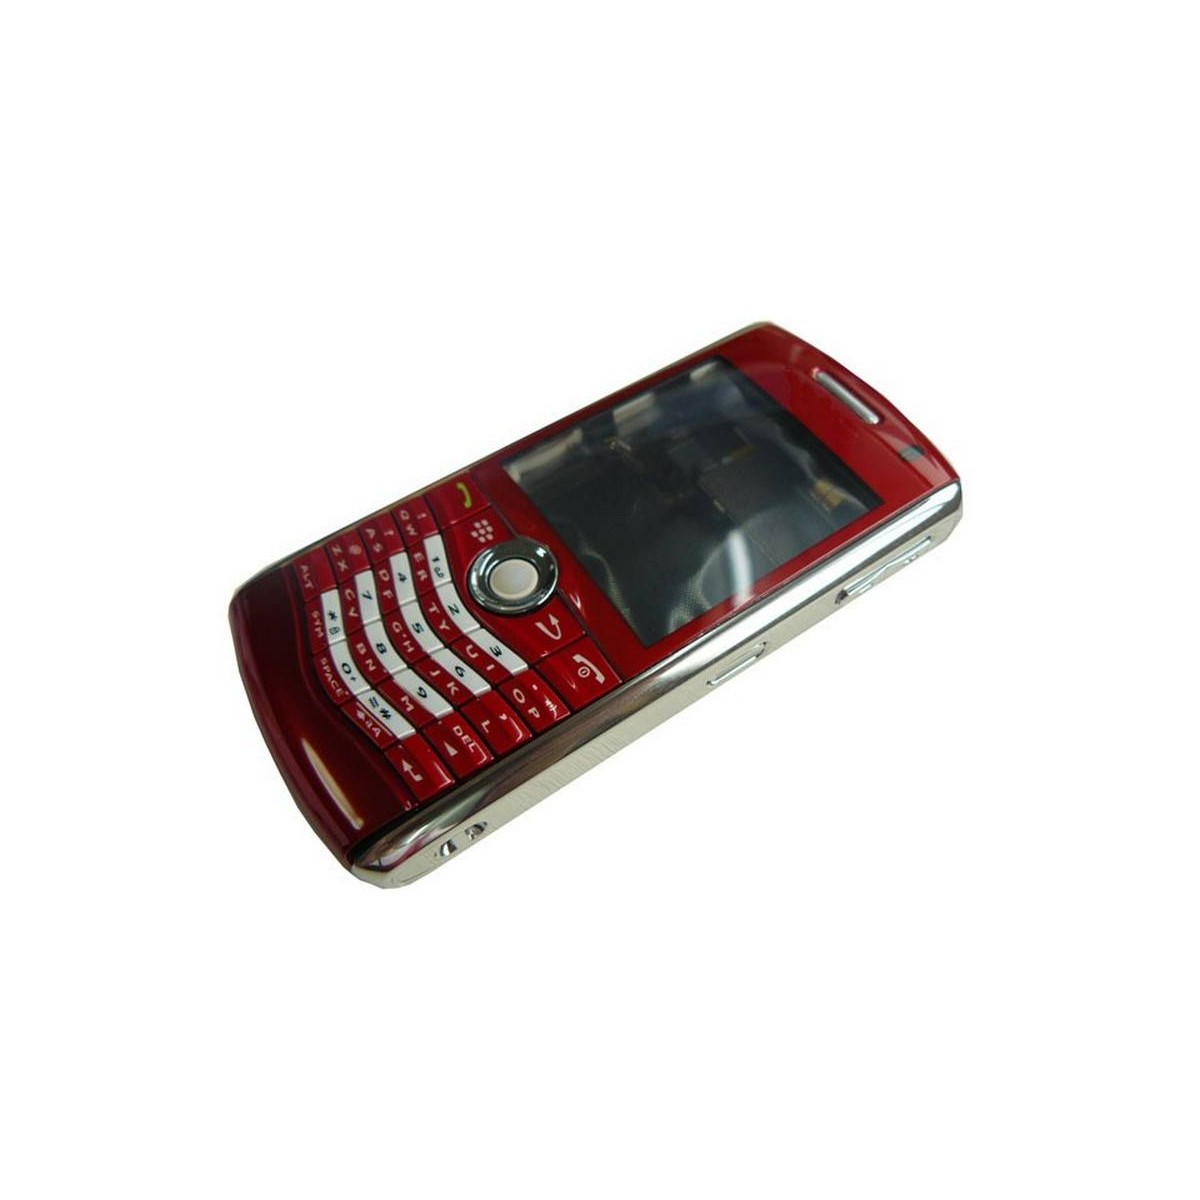 Carcaça BlackBerry 8120, 8130 Roja Completa